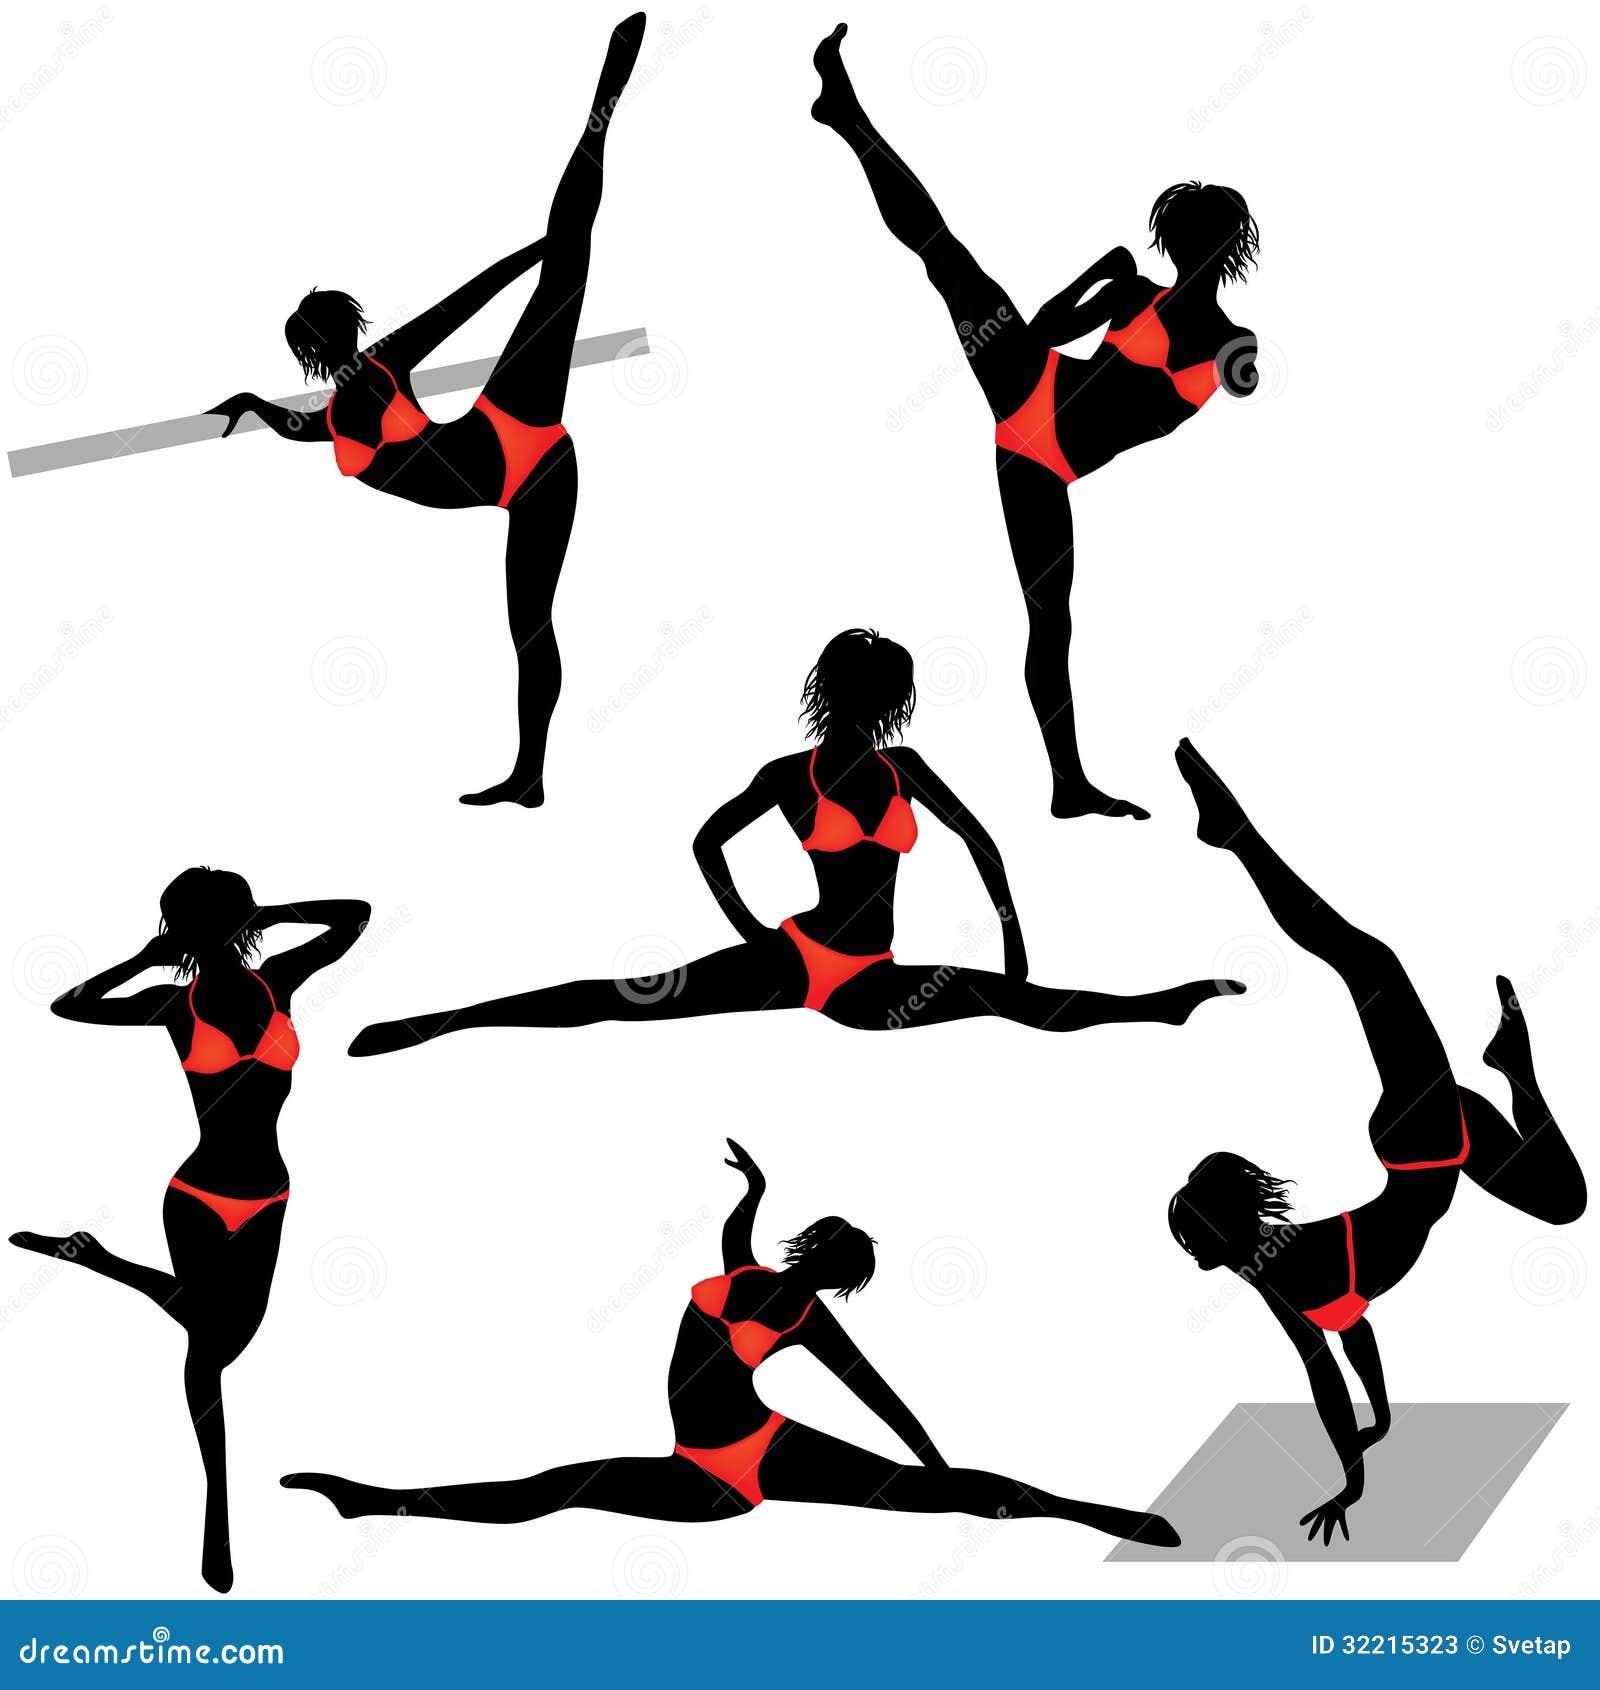 Meditation stretching video